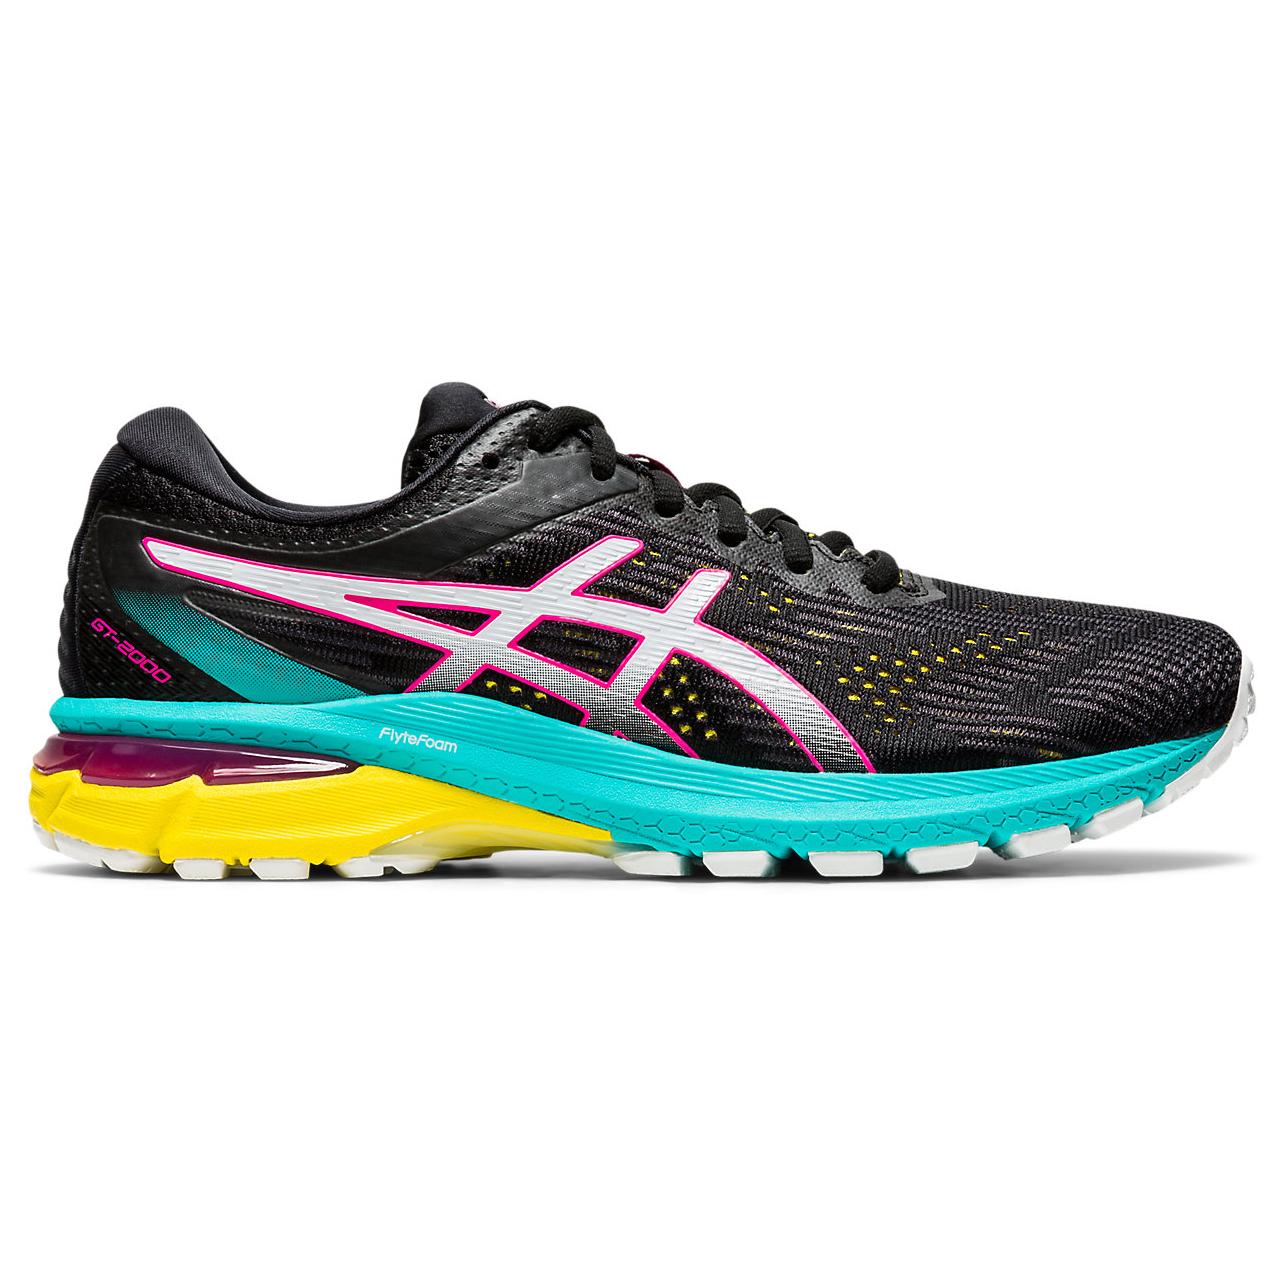 Asics - Women's GT-2000 8 Trail - Trail running shoes - BLACK/WHITE   5,5 (US)